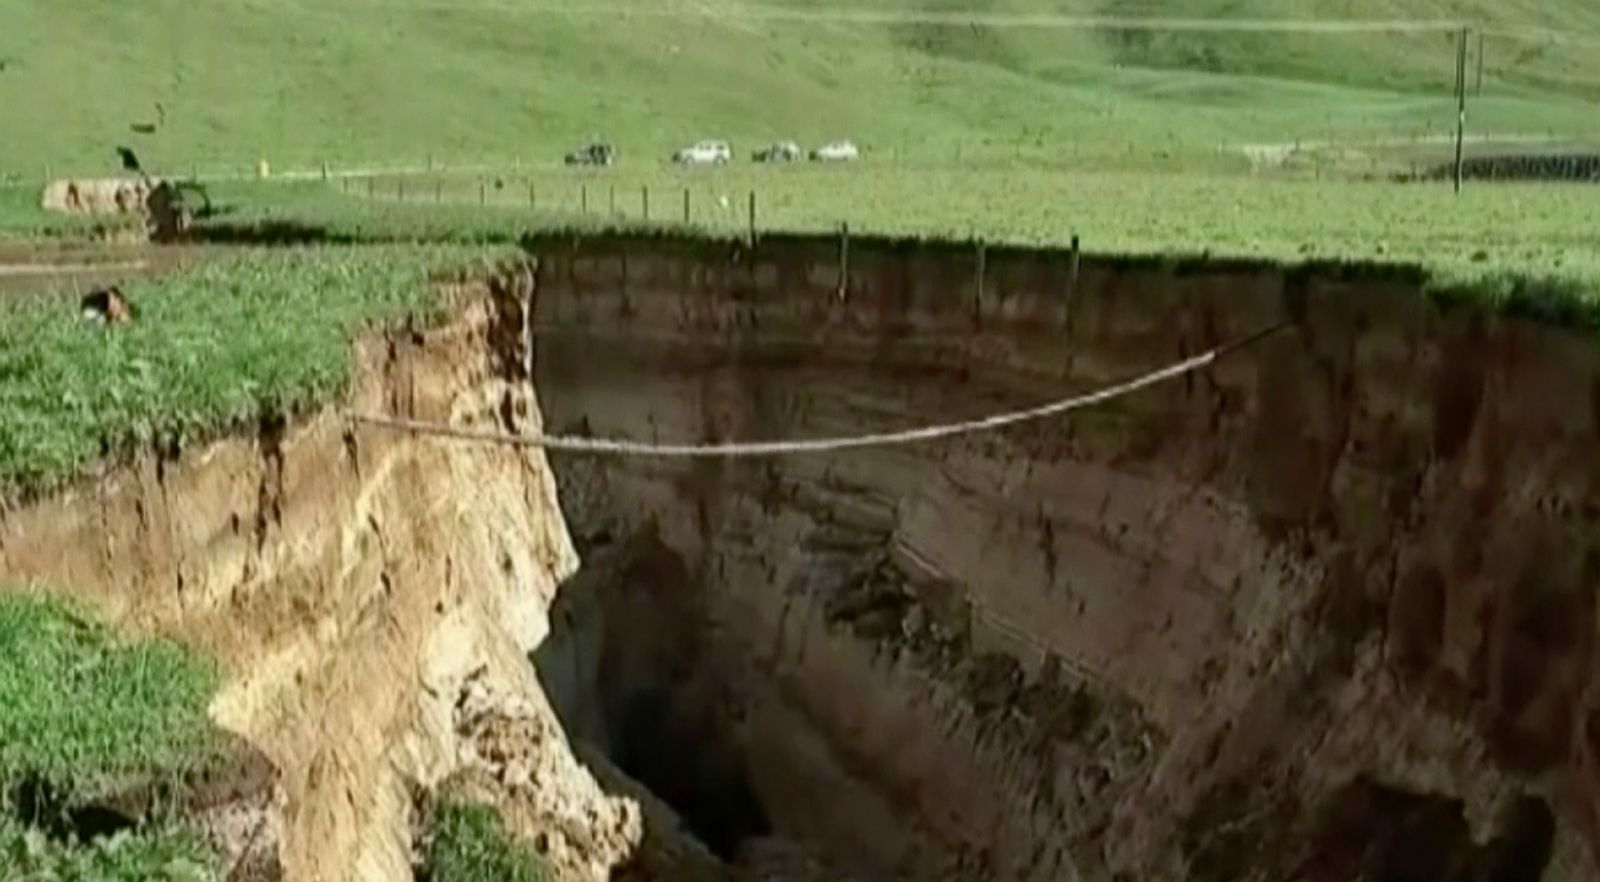 Incredible sinkholes around the world Photos - ABC News